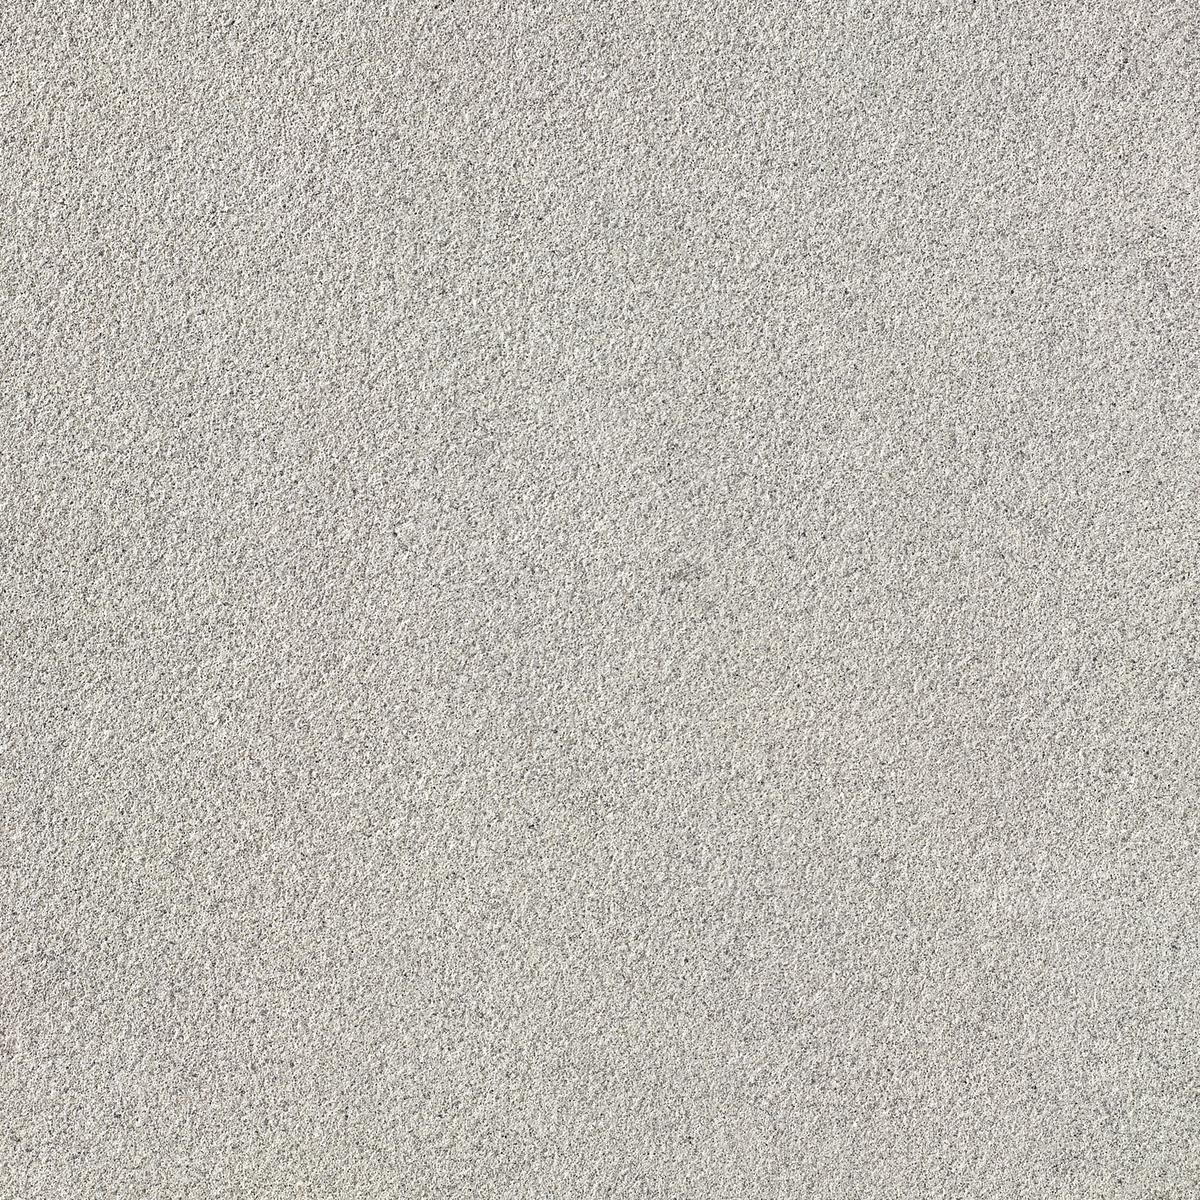 Tiles - VENTIFACTS - Textured Light Grey 300x600mm (8 pieces)